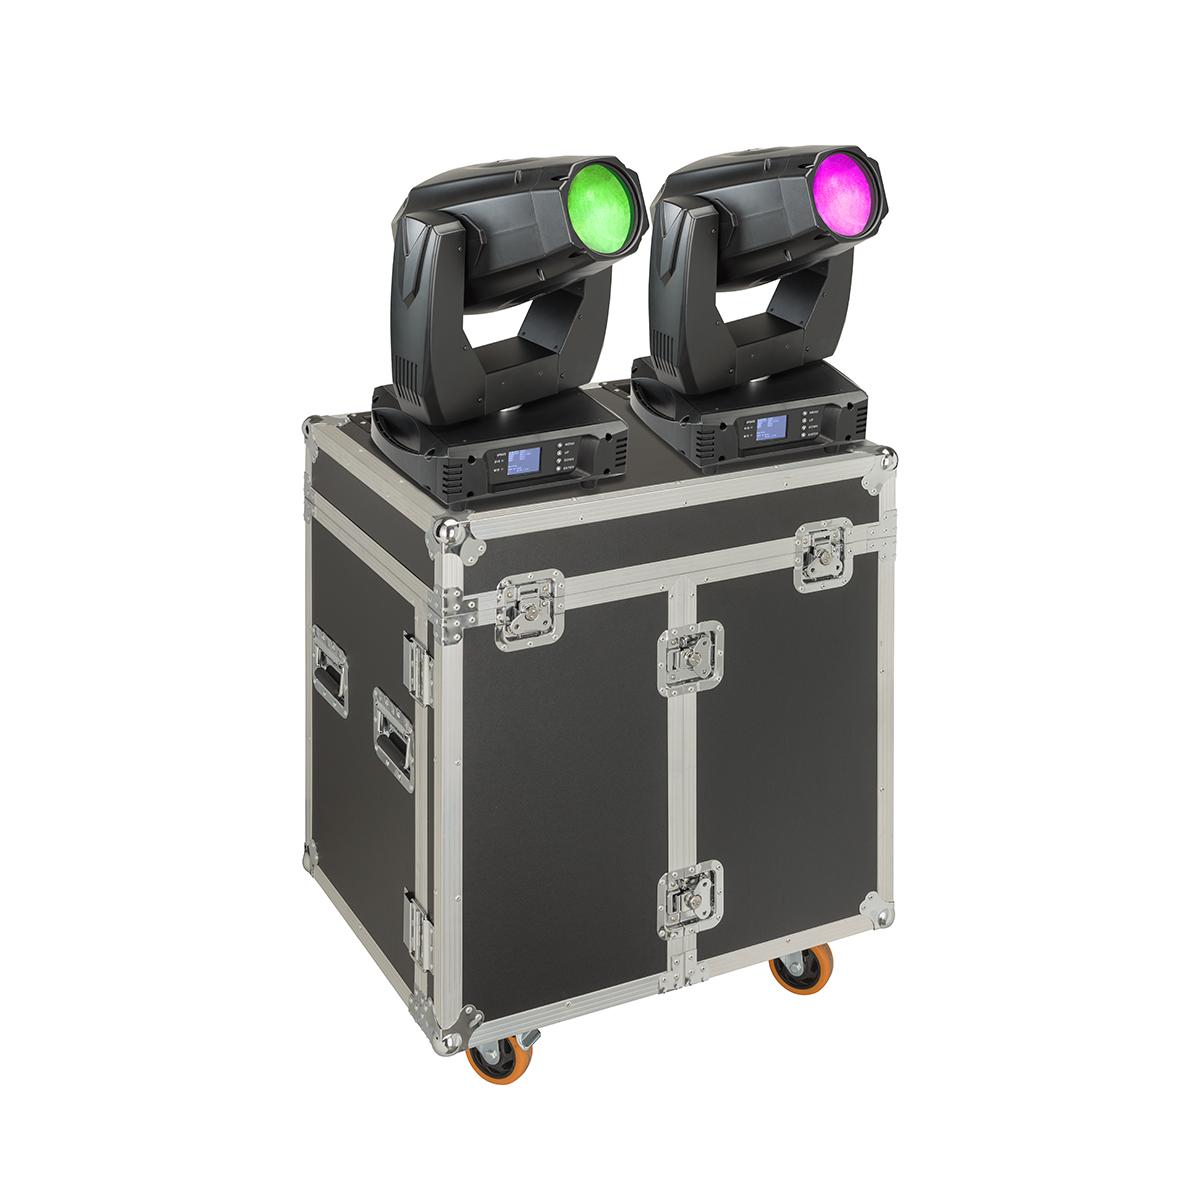 SET 2 TESTE MOBILI SOUNDSATION SPIRE XL 440 CON FLIGHT CASE